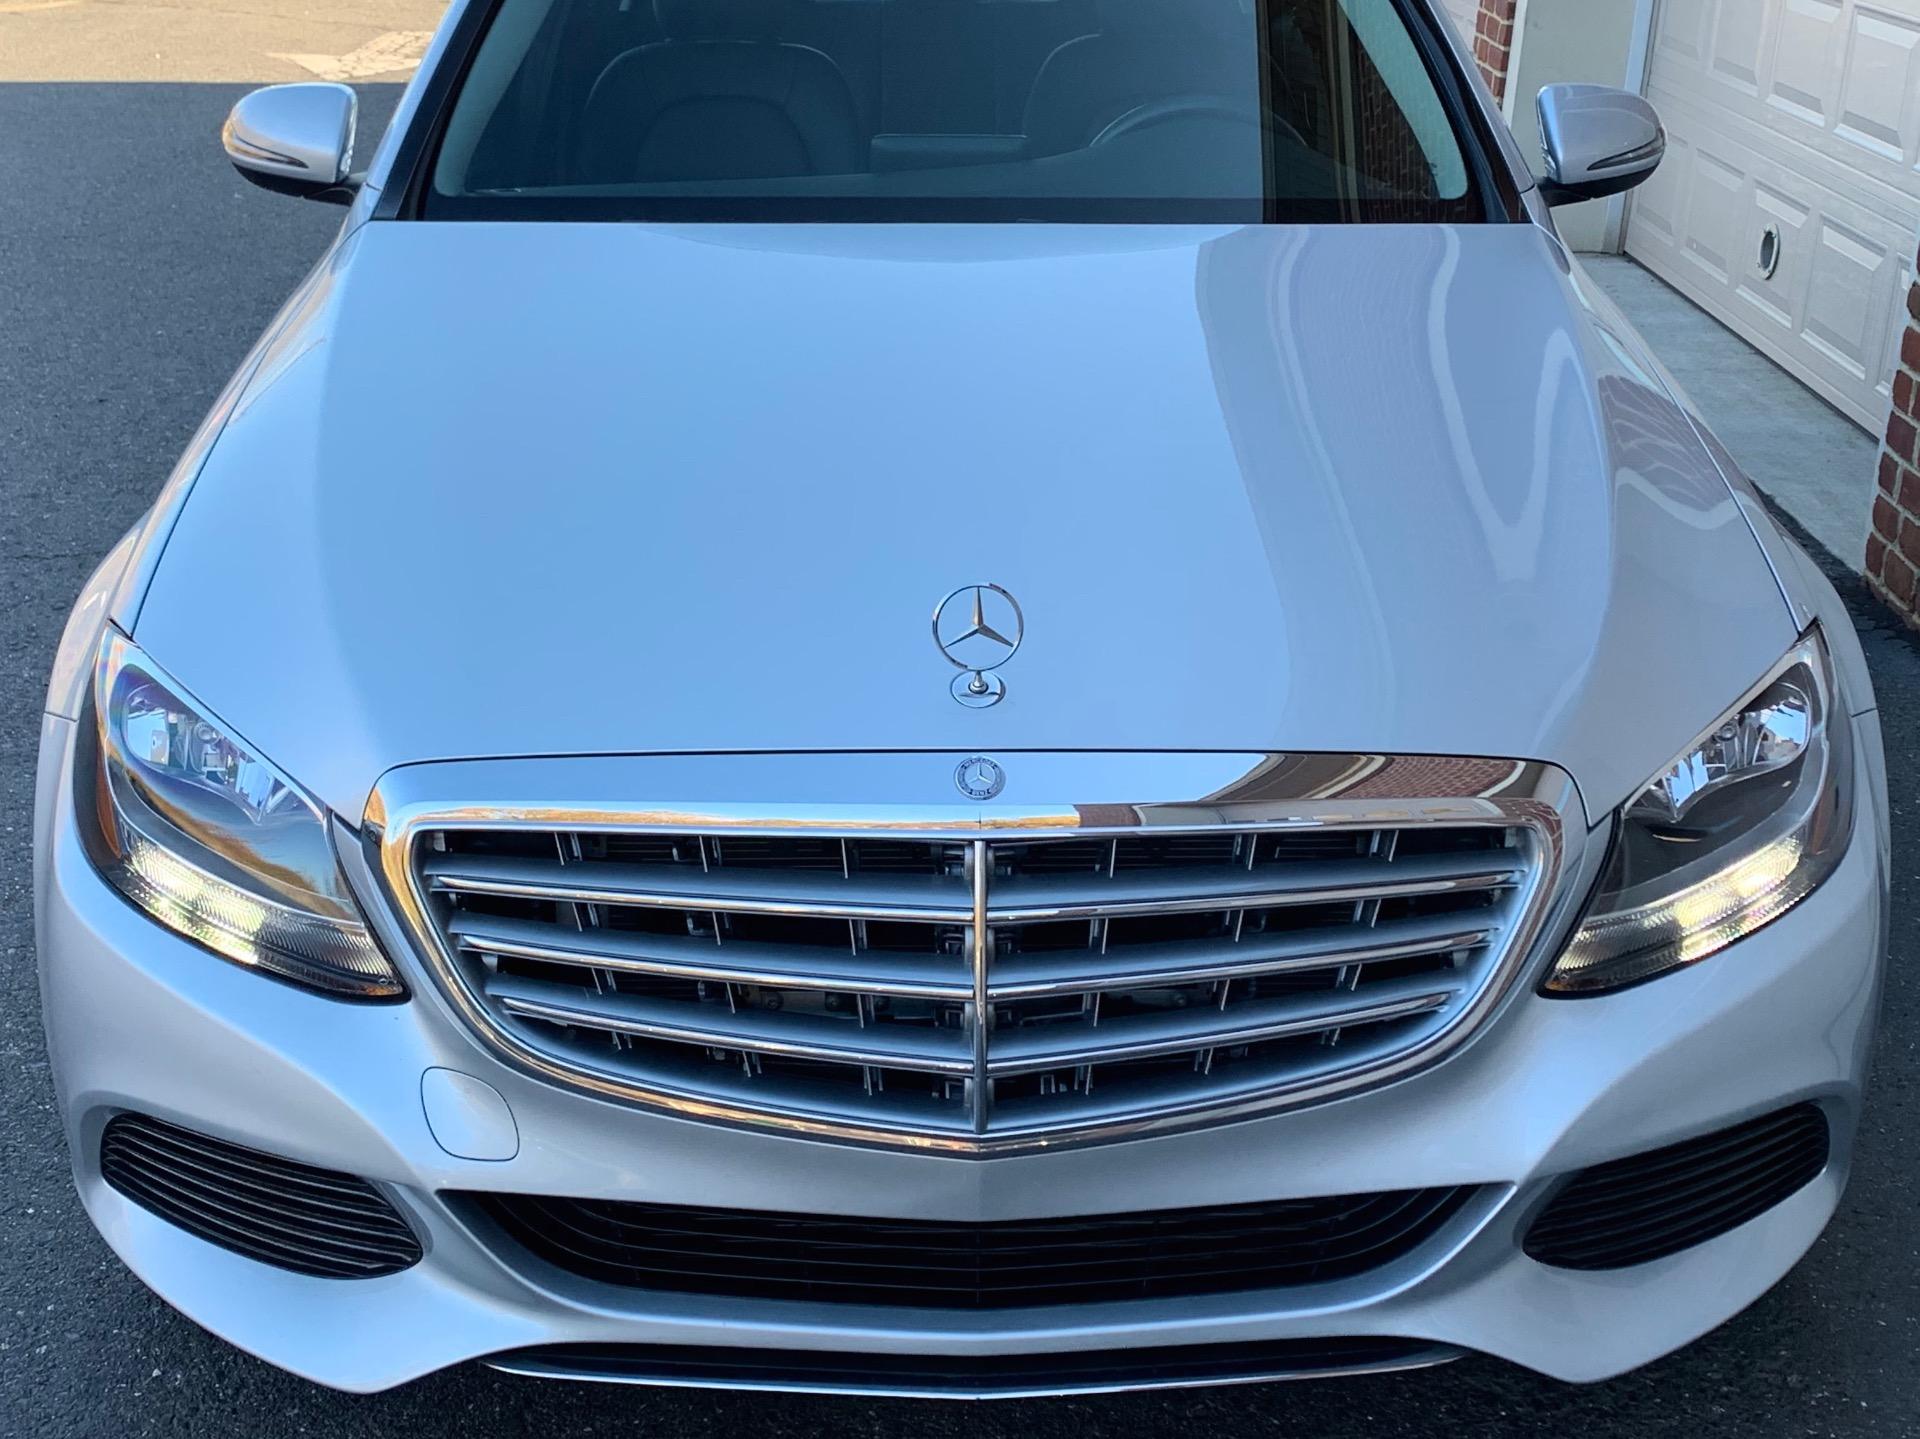 Used-2016-Mercedes-Benz-C-Class-C-300-4MATIC